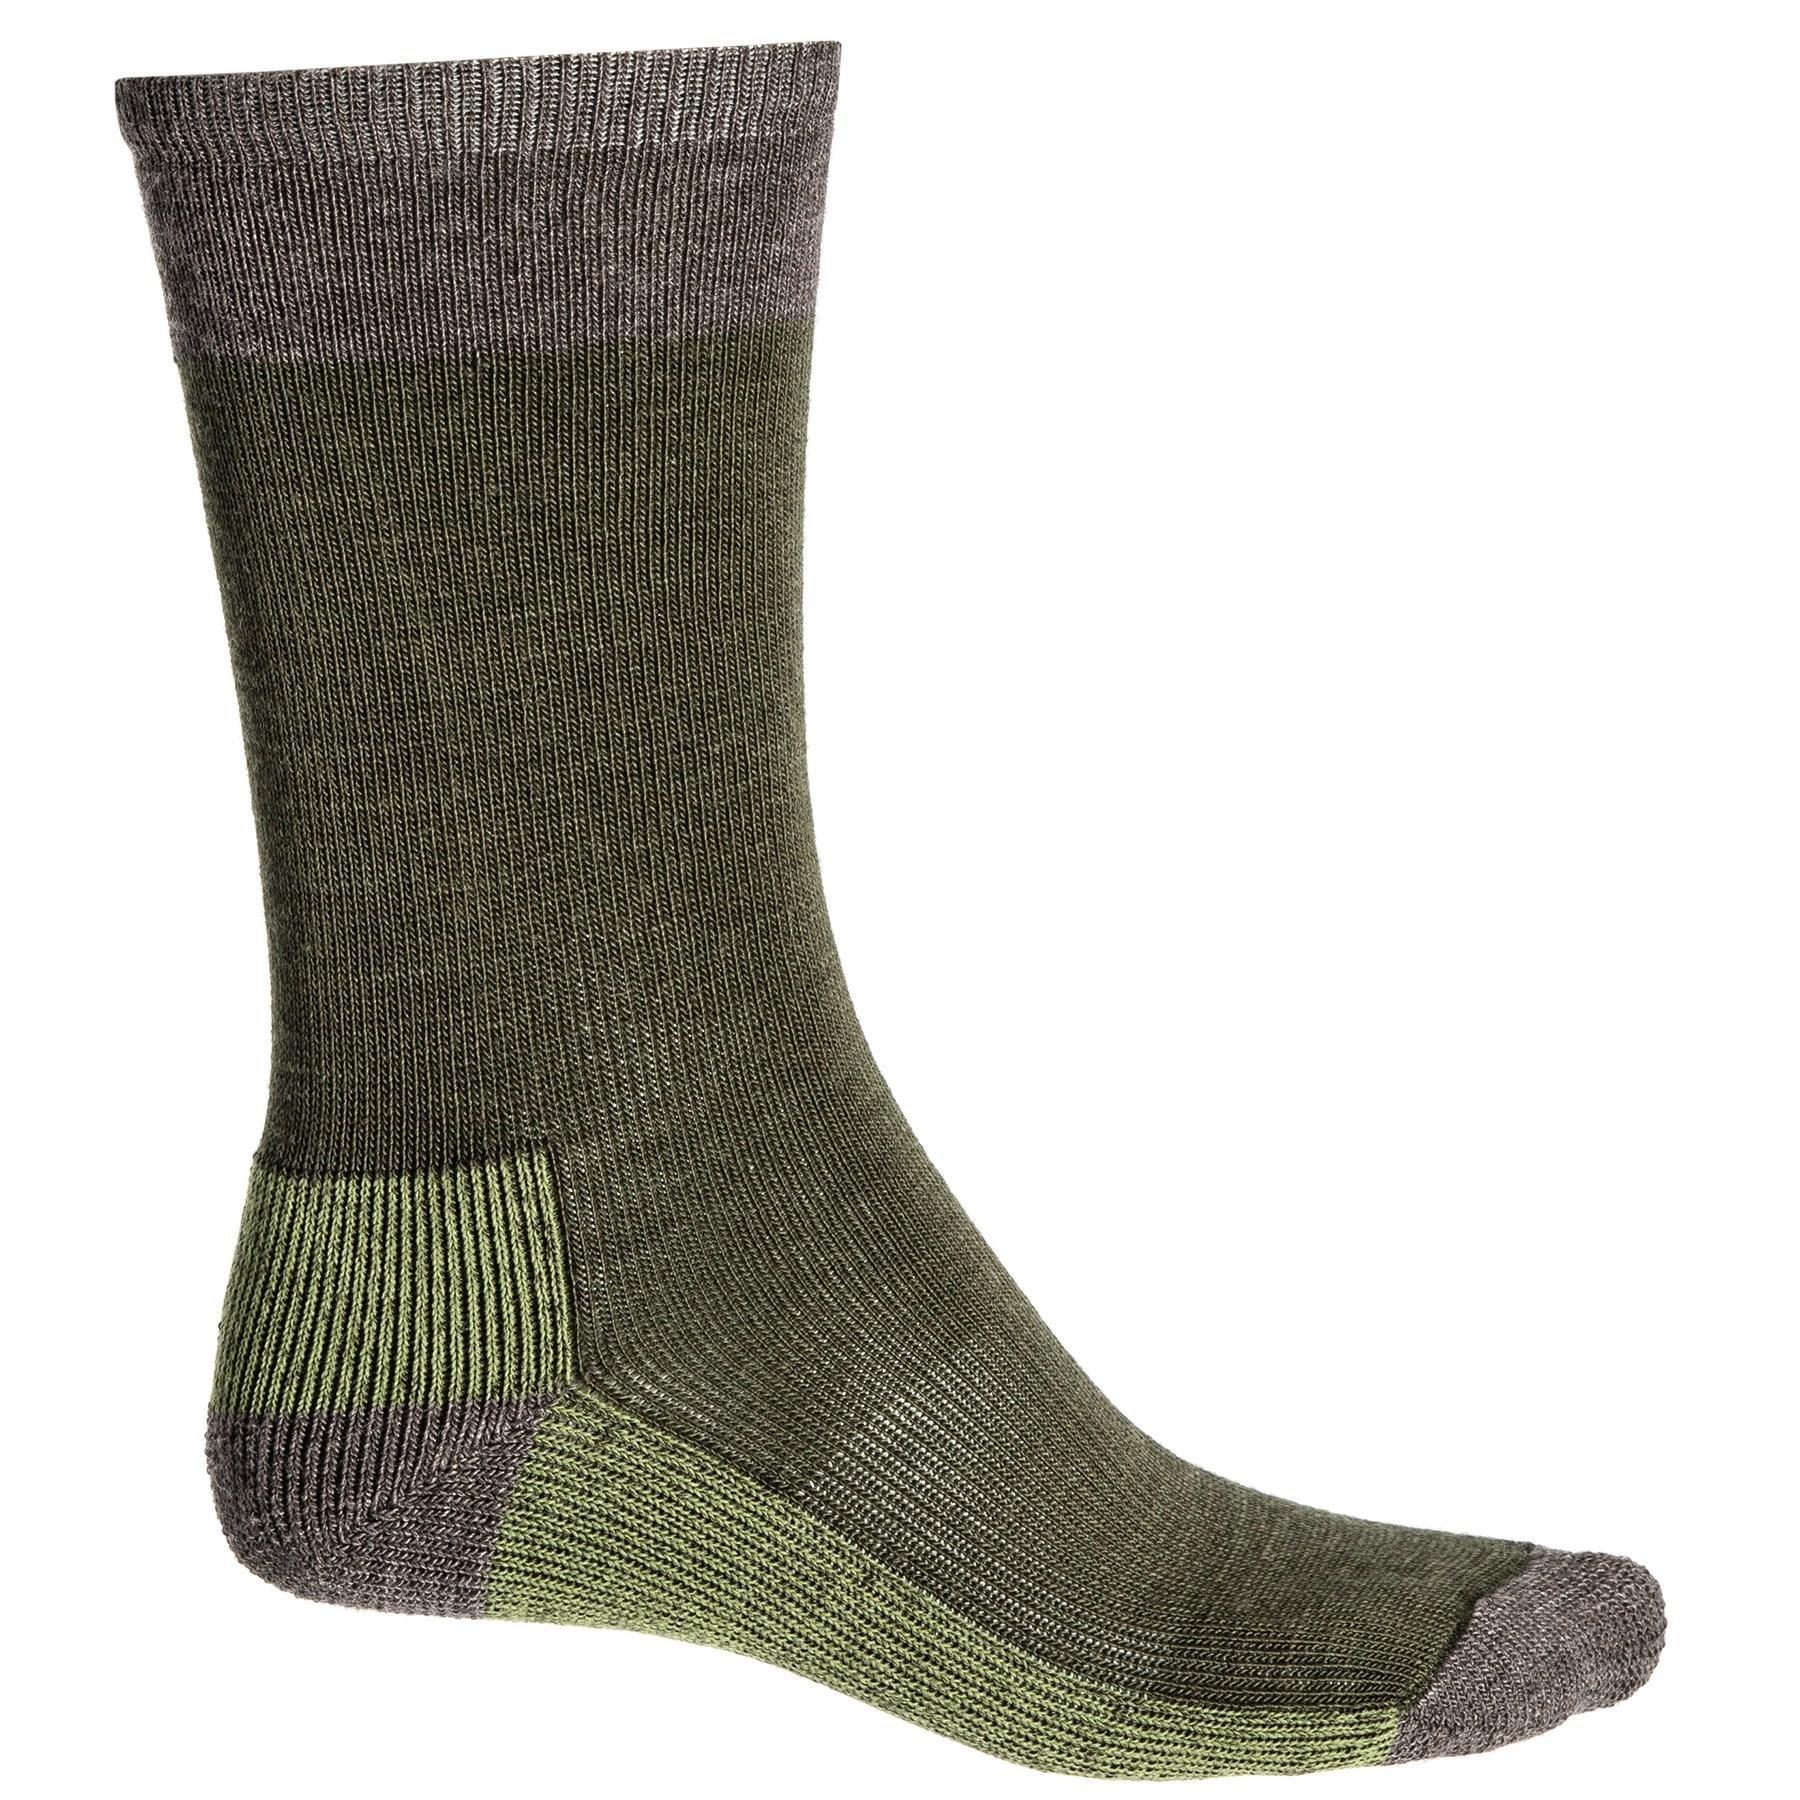 d28c951e9ac85 Lyst - Smartwool Hiker Street Socks in Green for Men